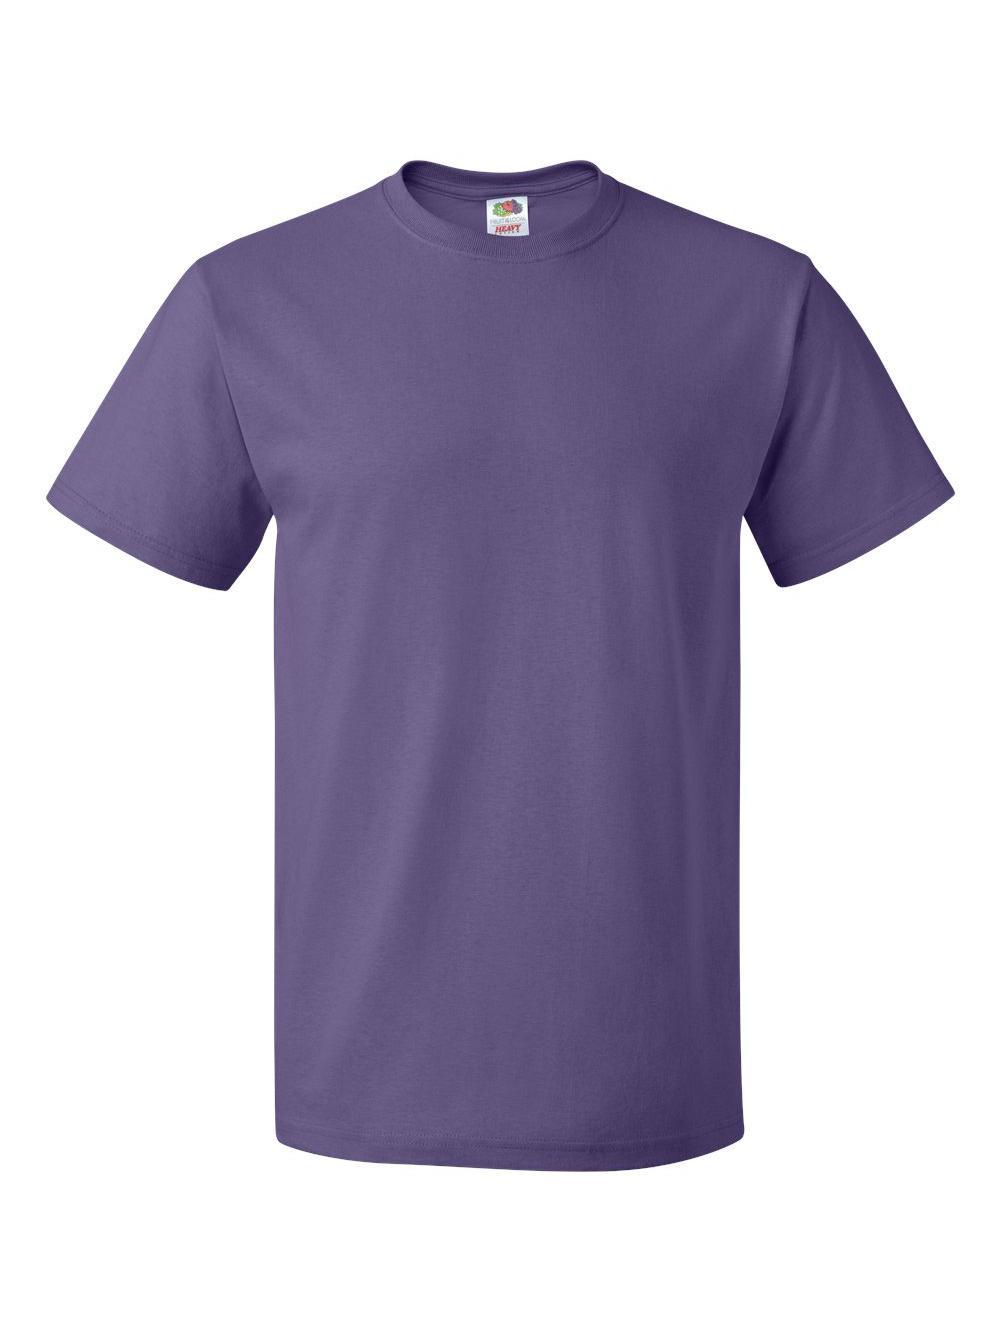 Fruit-of-the-Loom-HD-Cotton-Short-Sleeve-T-Shirt-3930R thumbnail 93